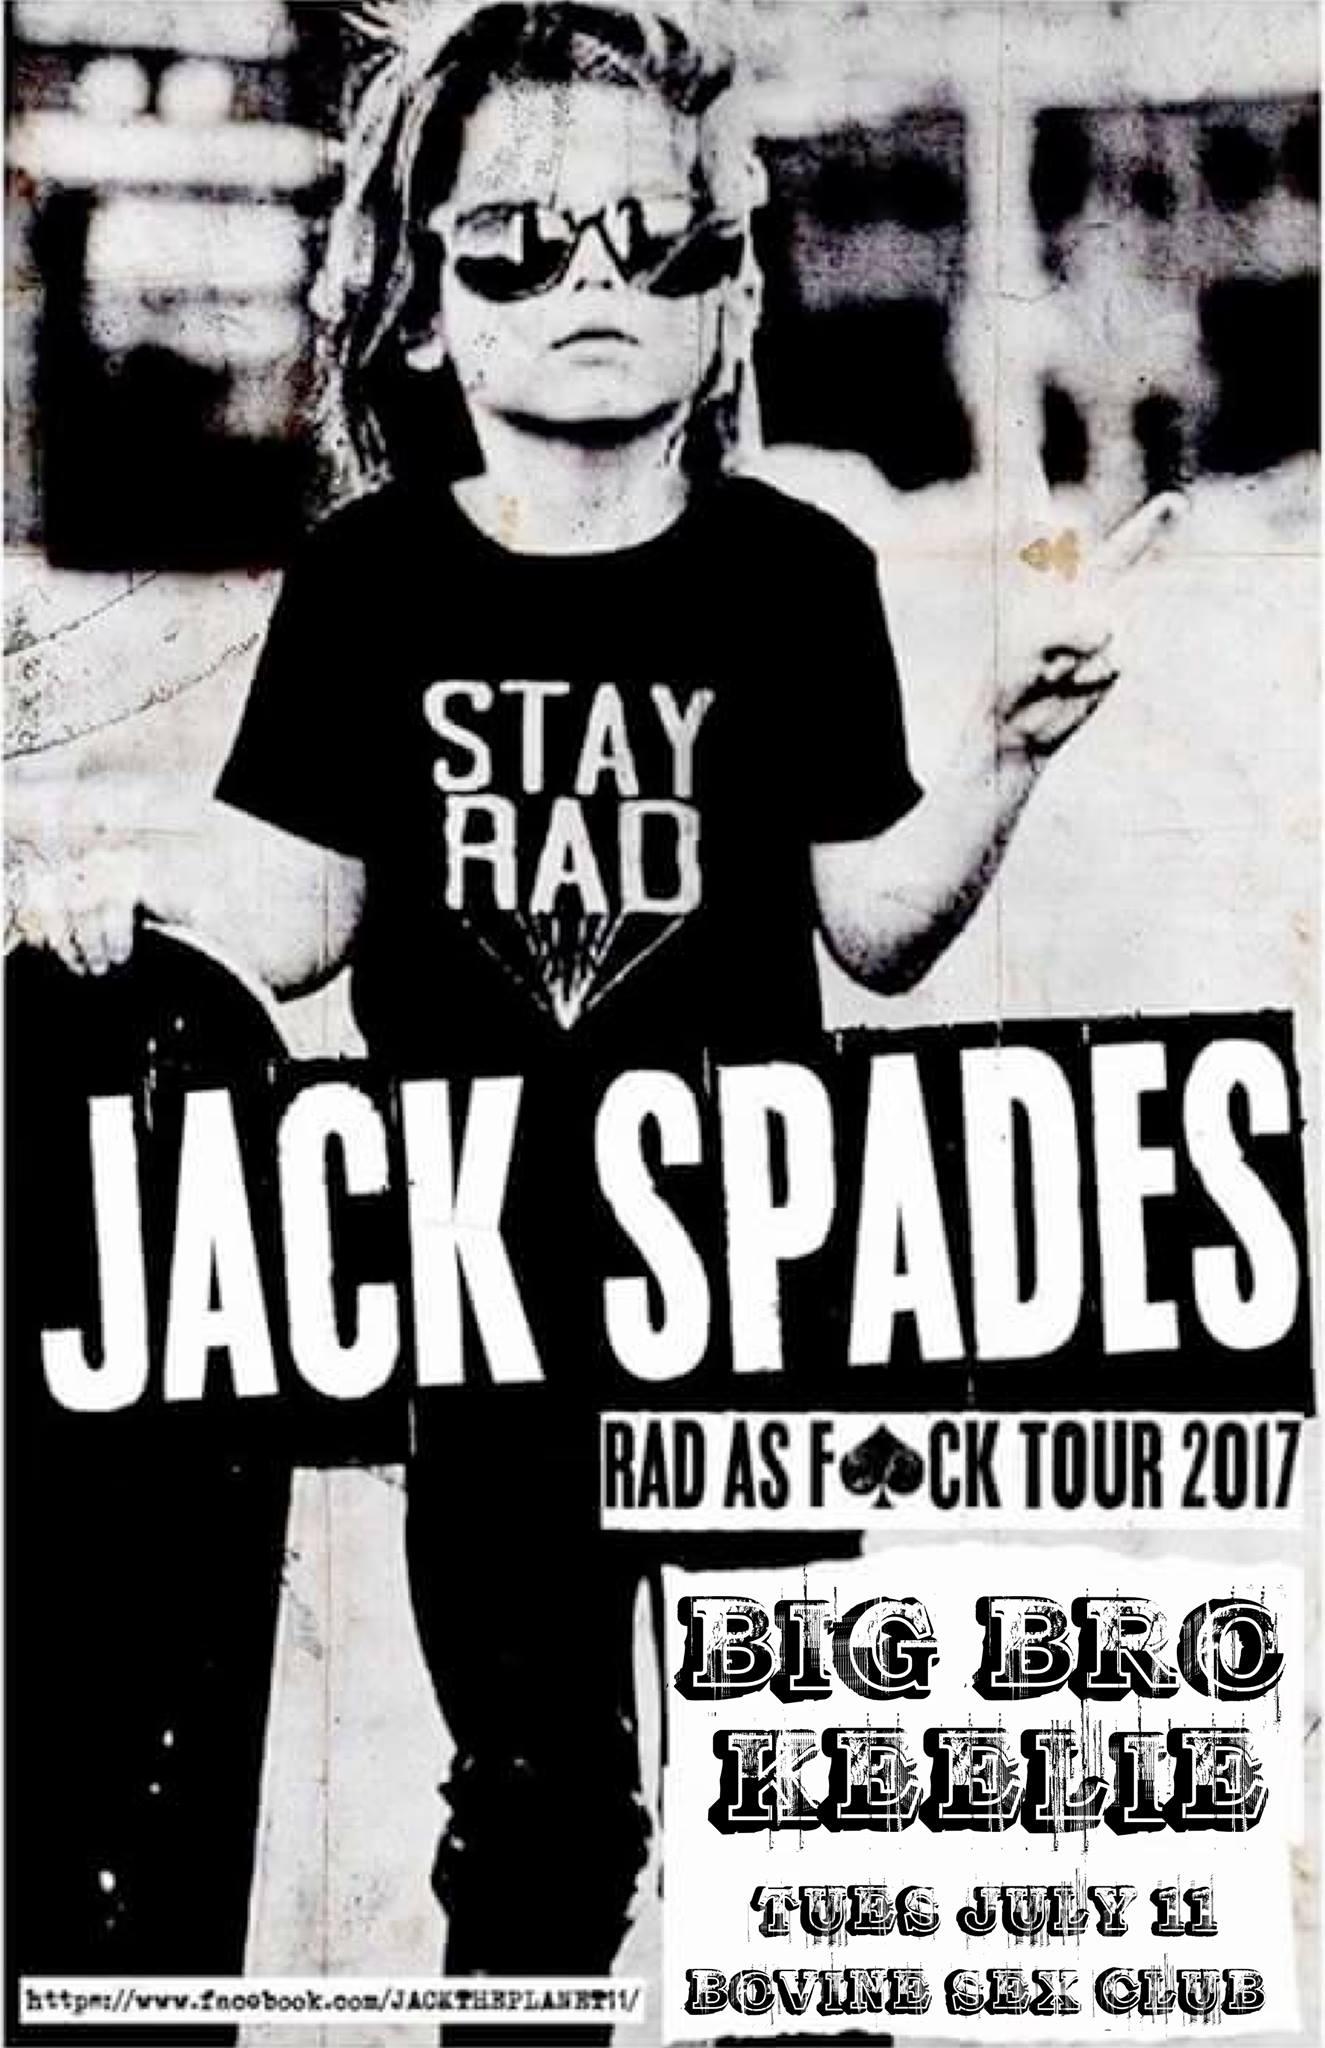 Jack Spades